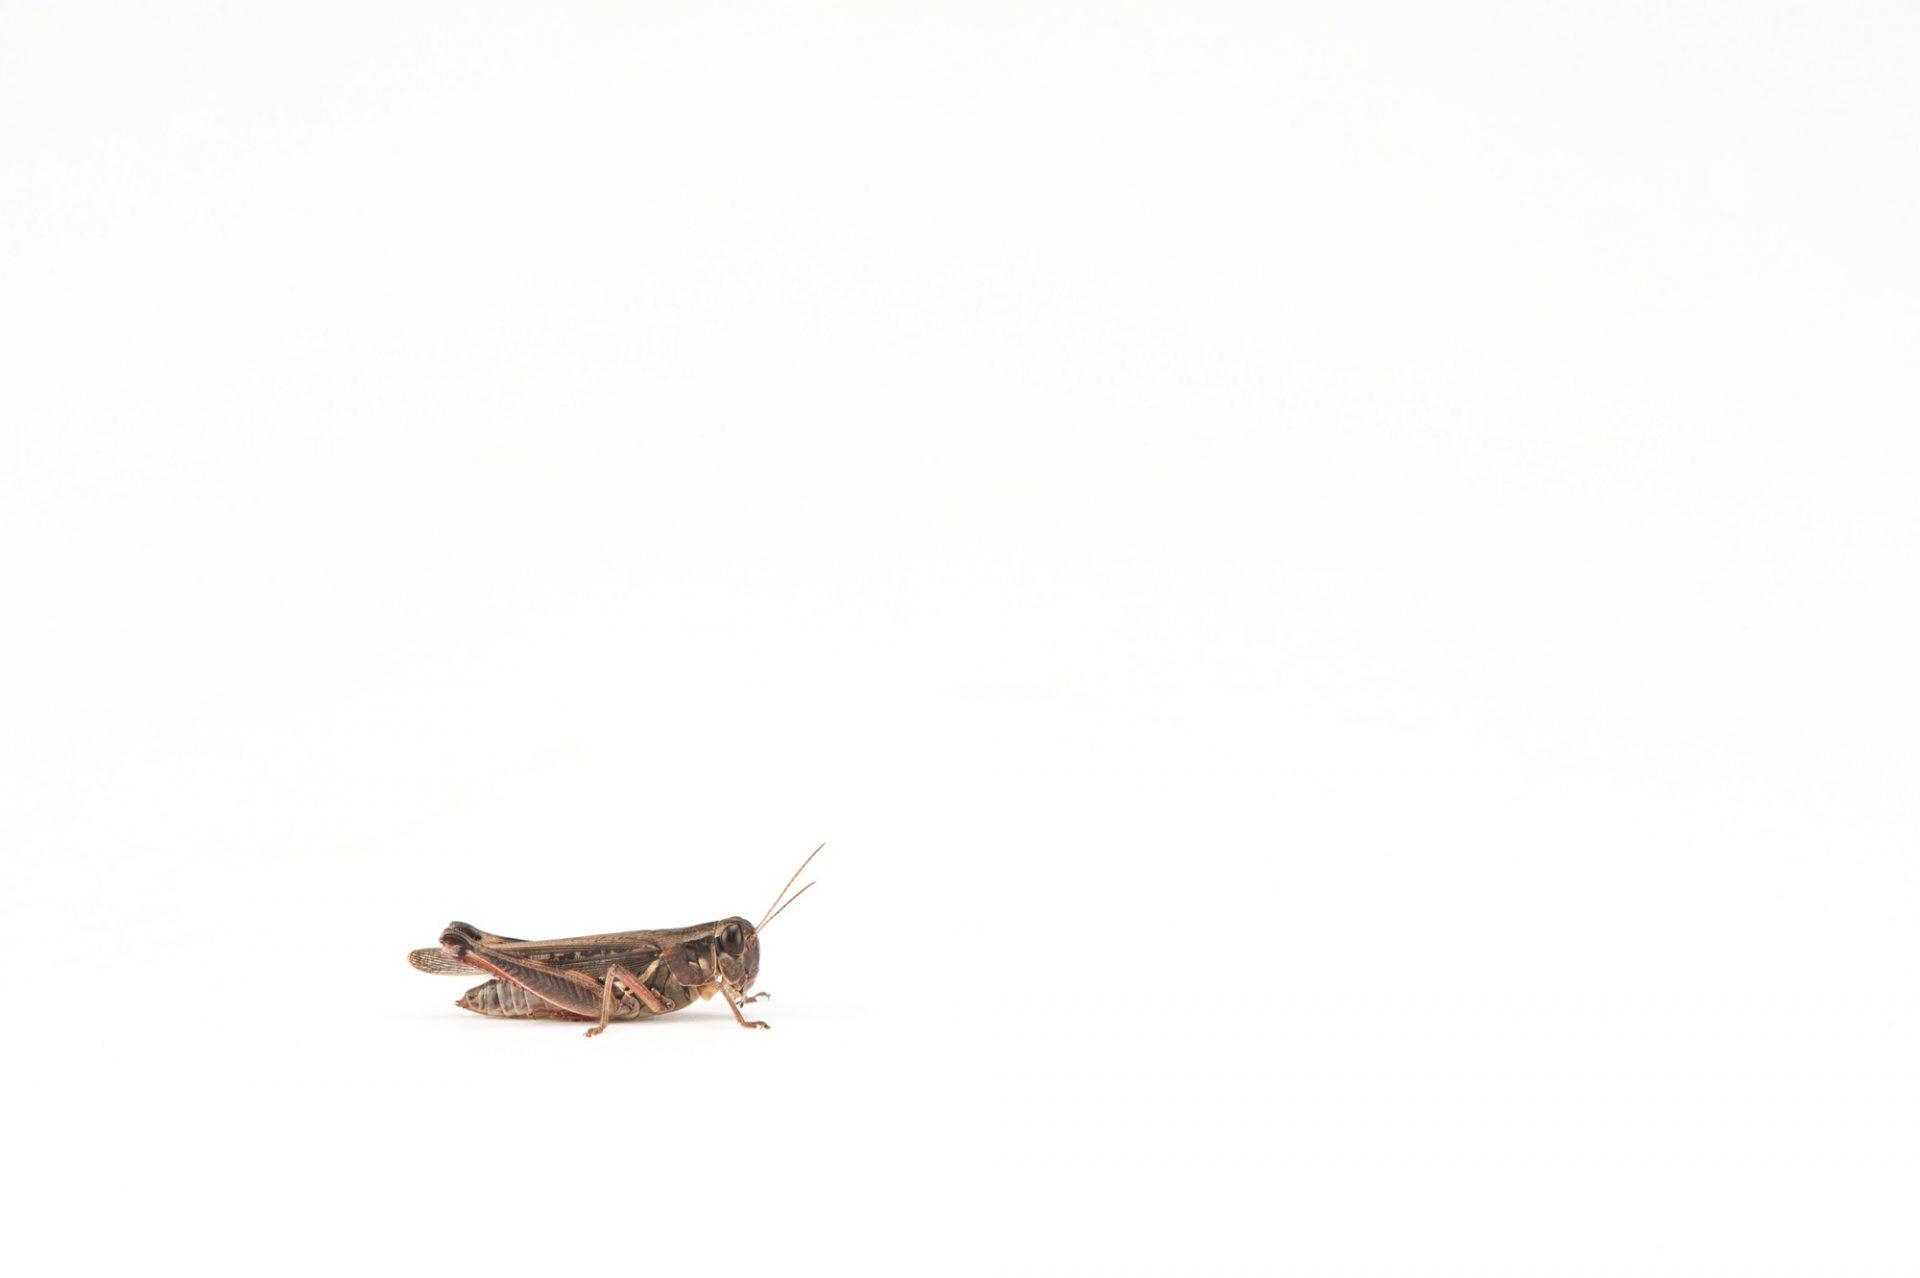 A narrow-winged spur-throat grasshopper (Melanoplus angustipennis) in Lincoln, Nebraska.